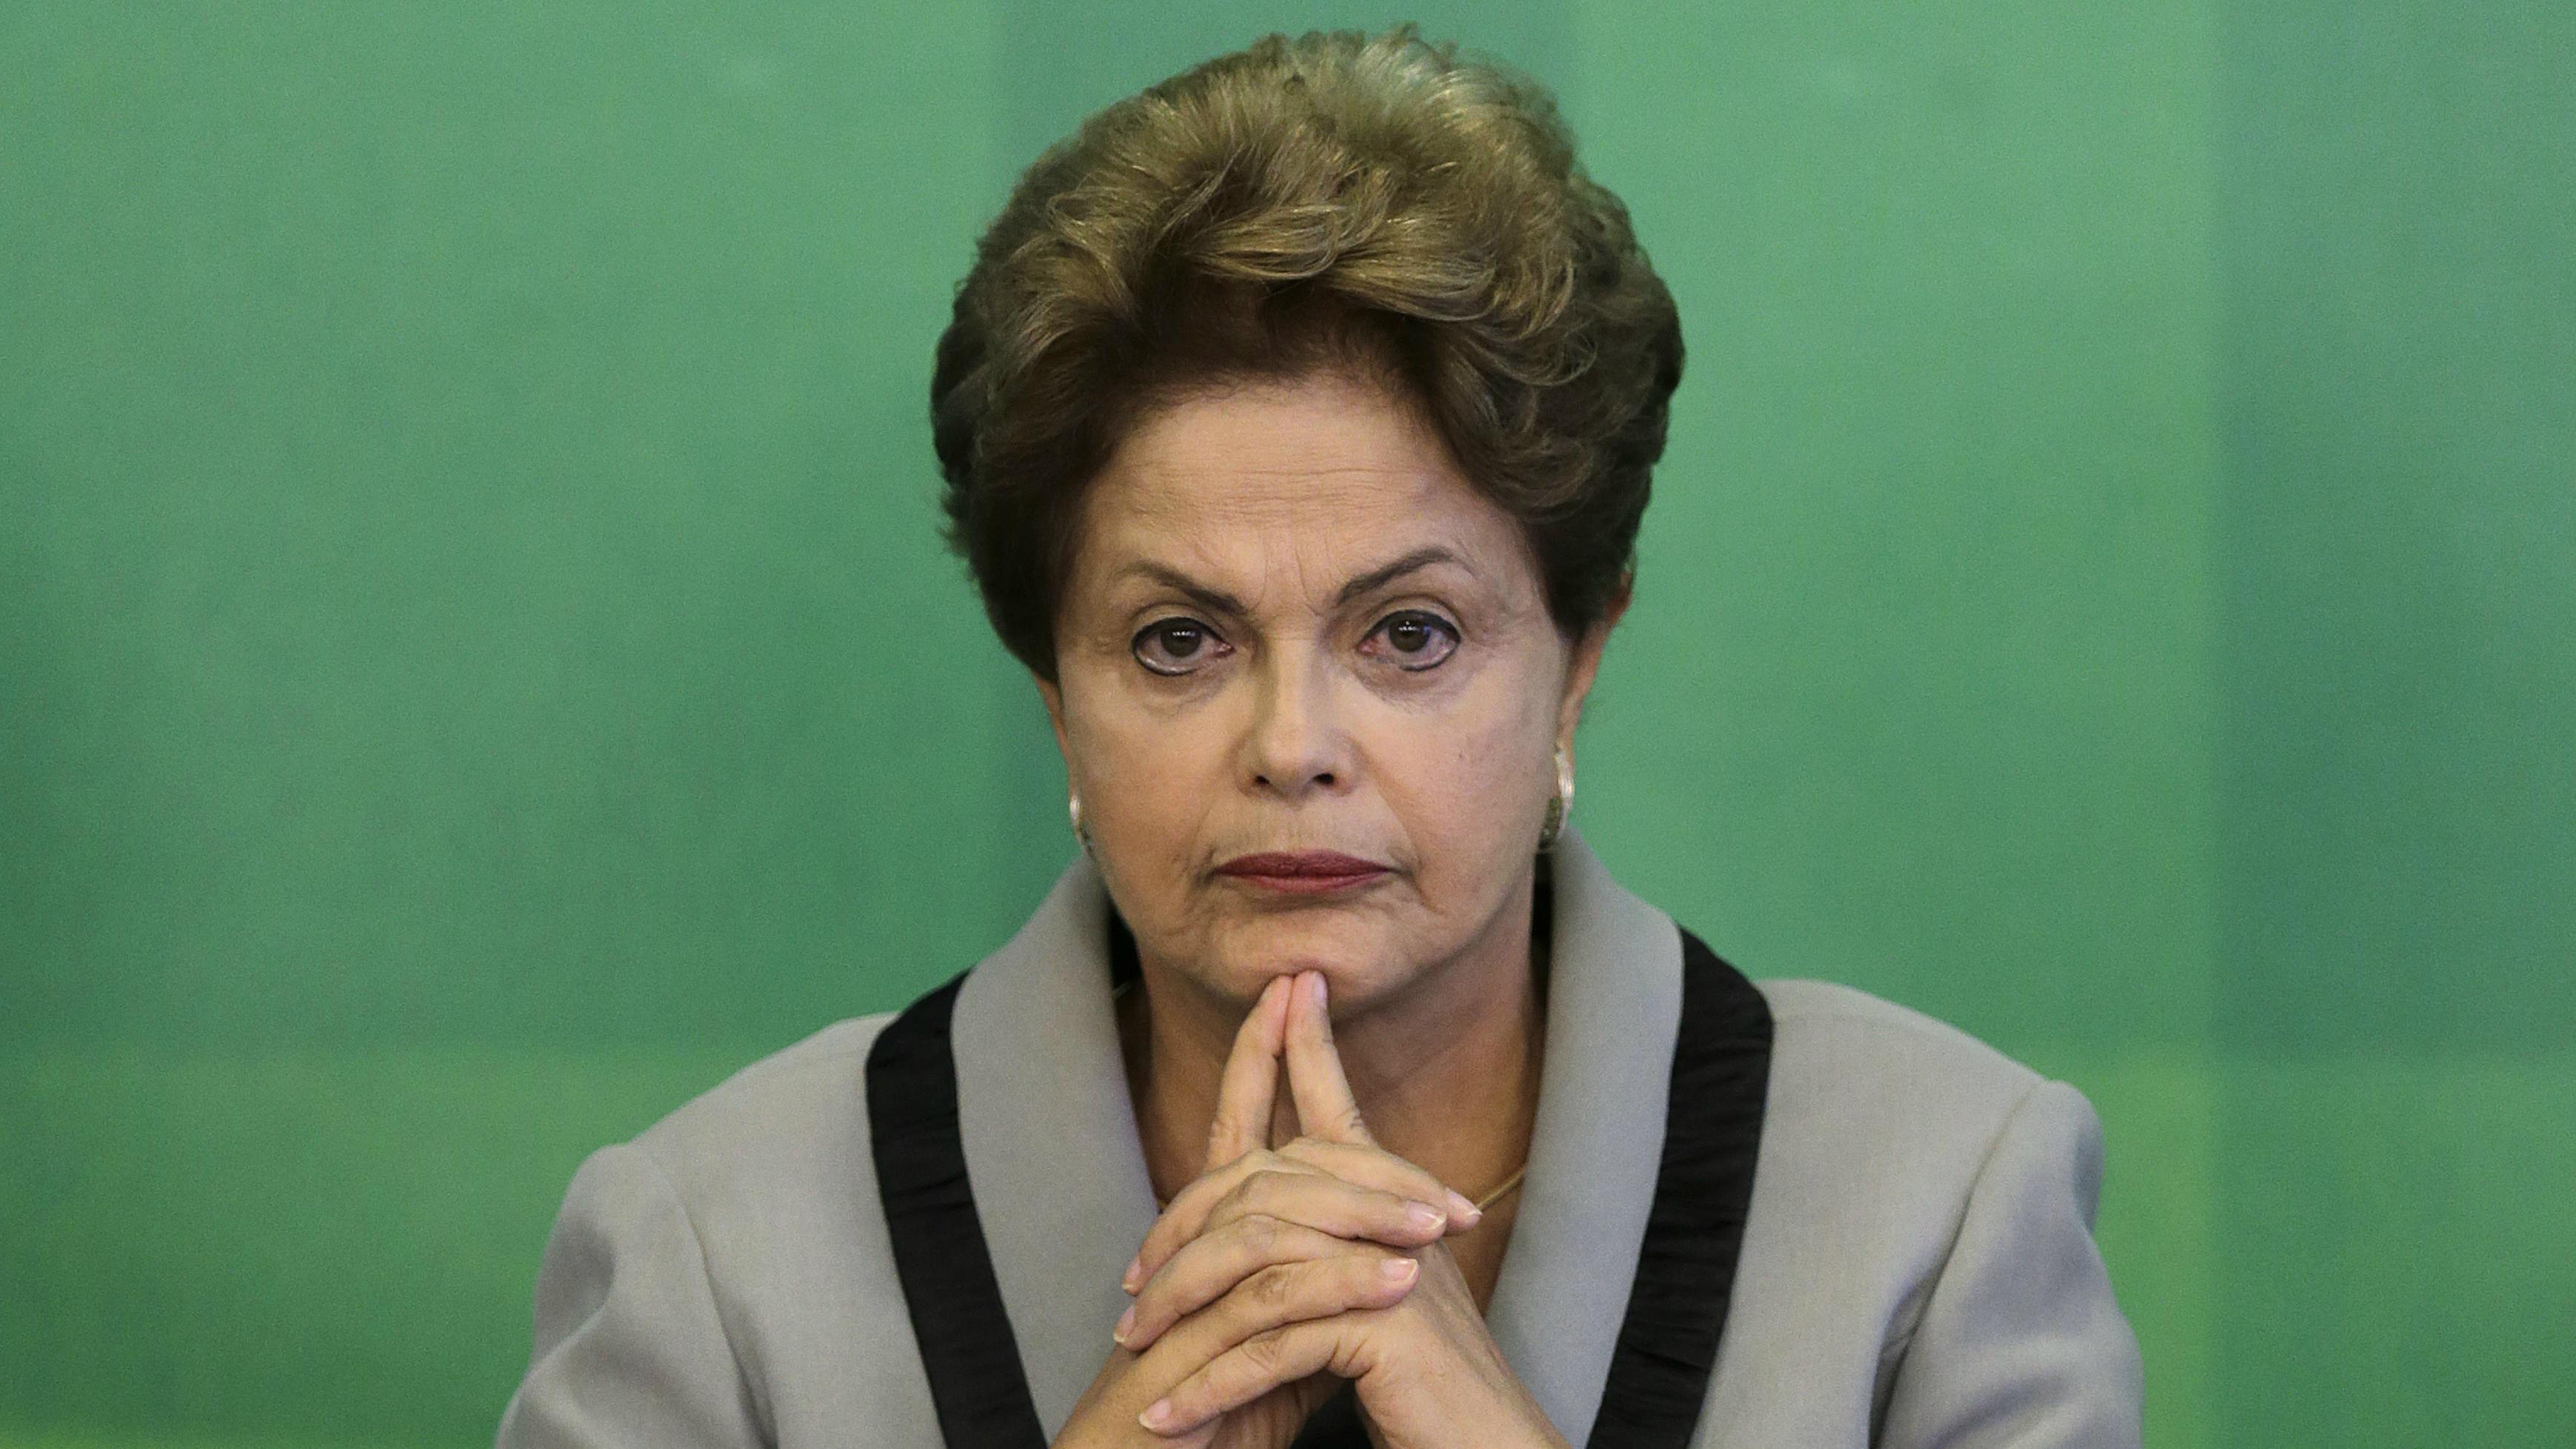 Dilma Rousseff, corruption, popular opinion